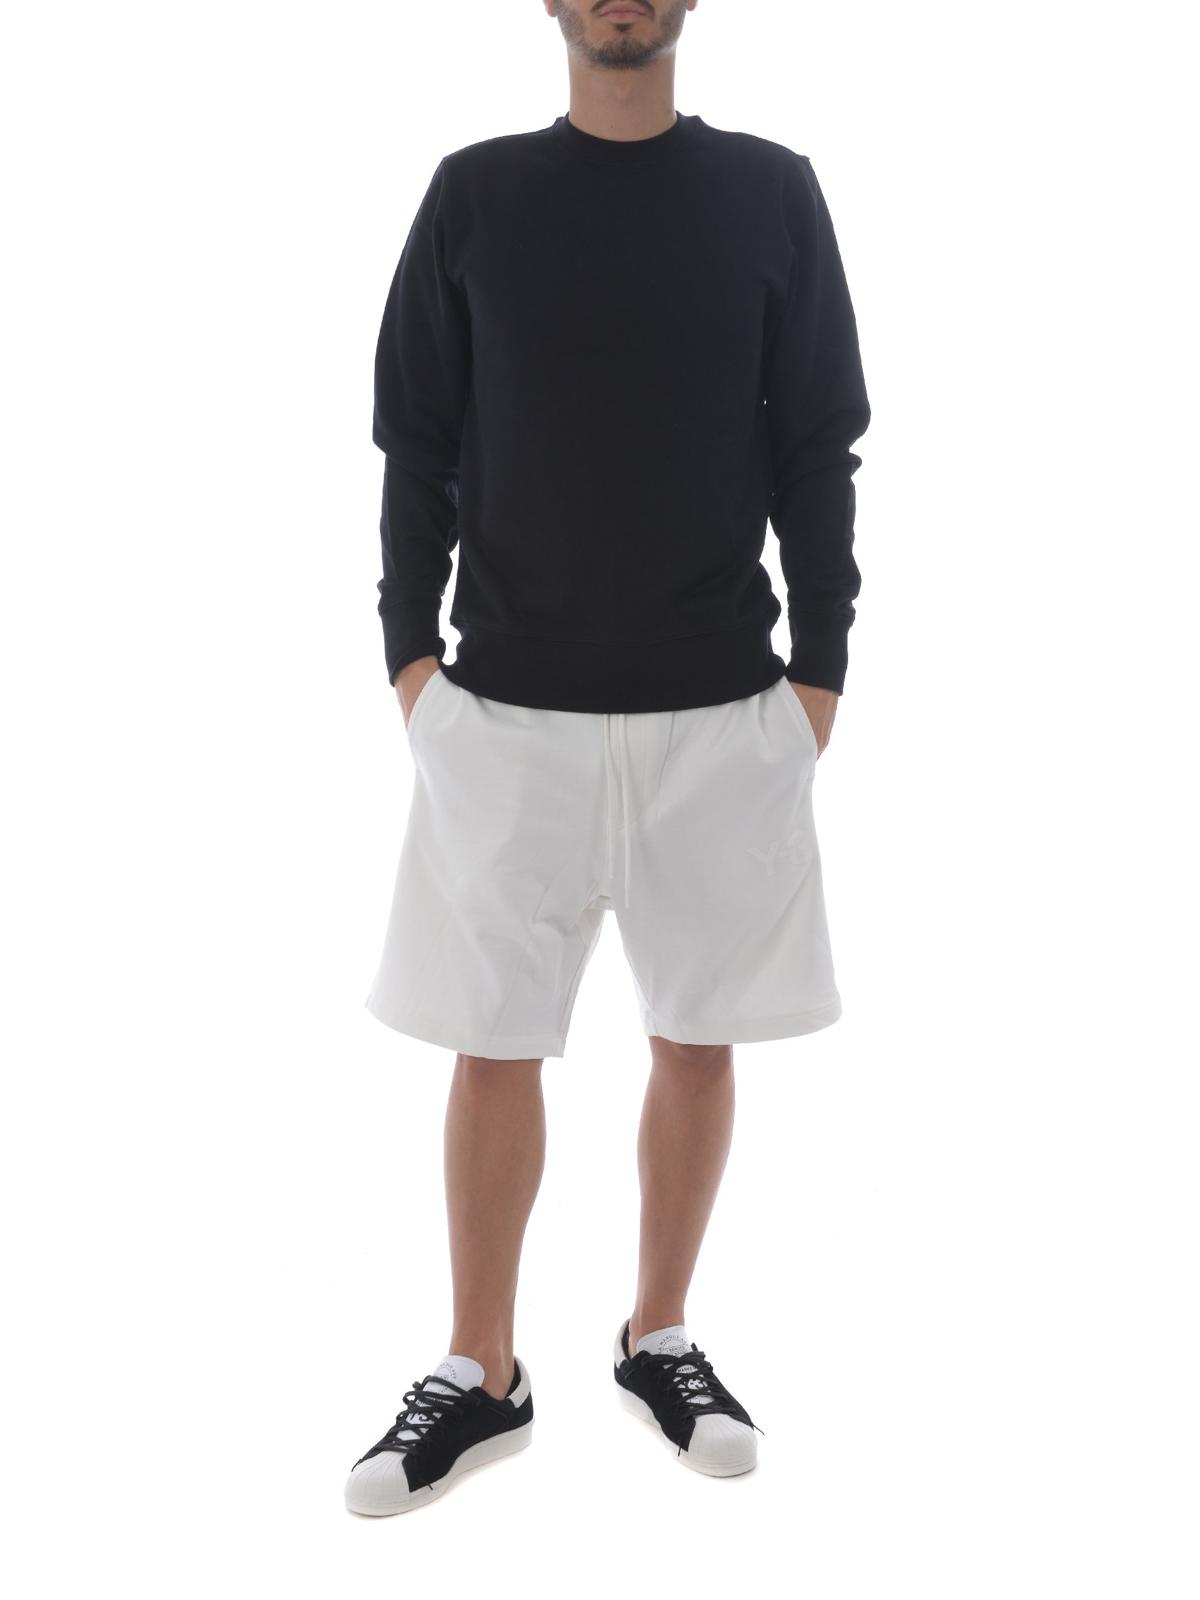 Sweatshirts Cobra amp; Black 3 Y Cotton Sweaters Sweatshirt Adidas wqxzavFpYx